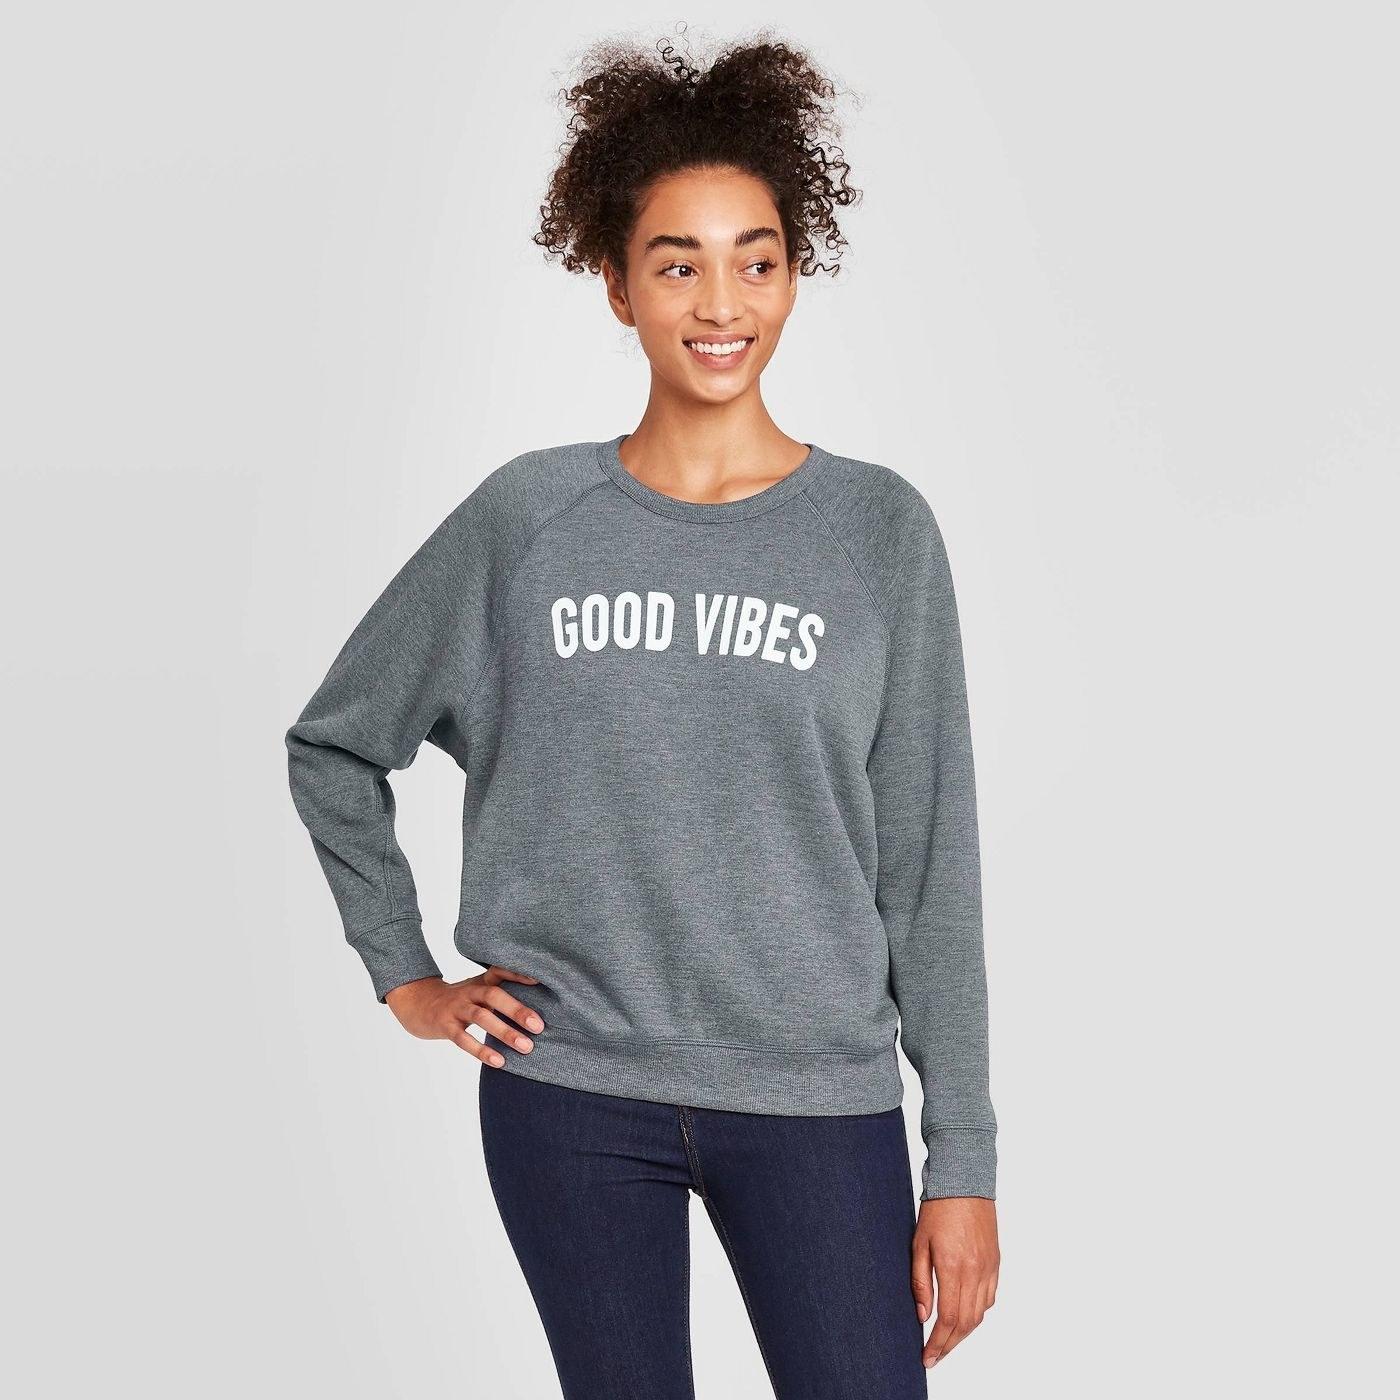 Model in good vibes graphic sweatshirt